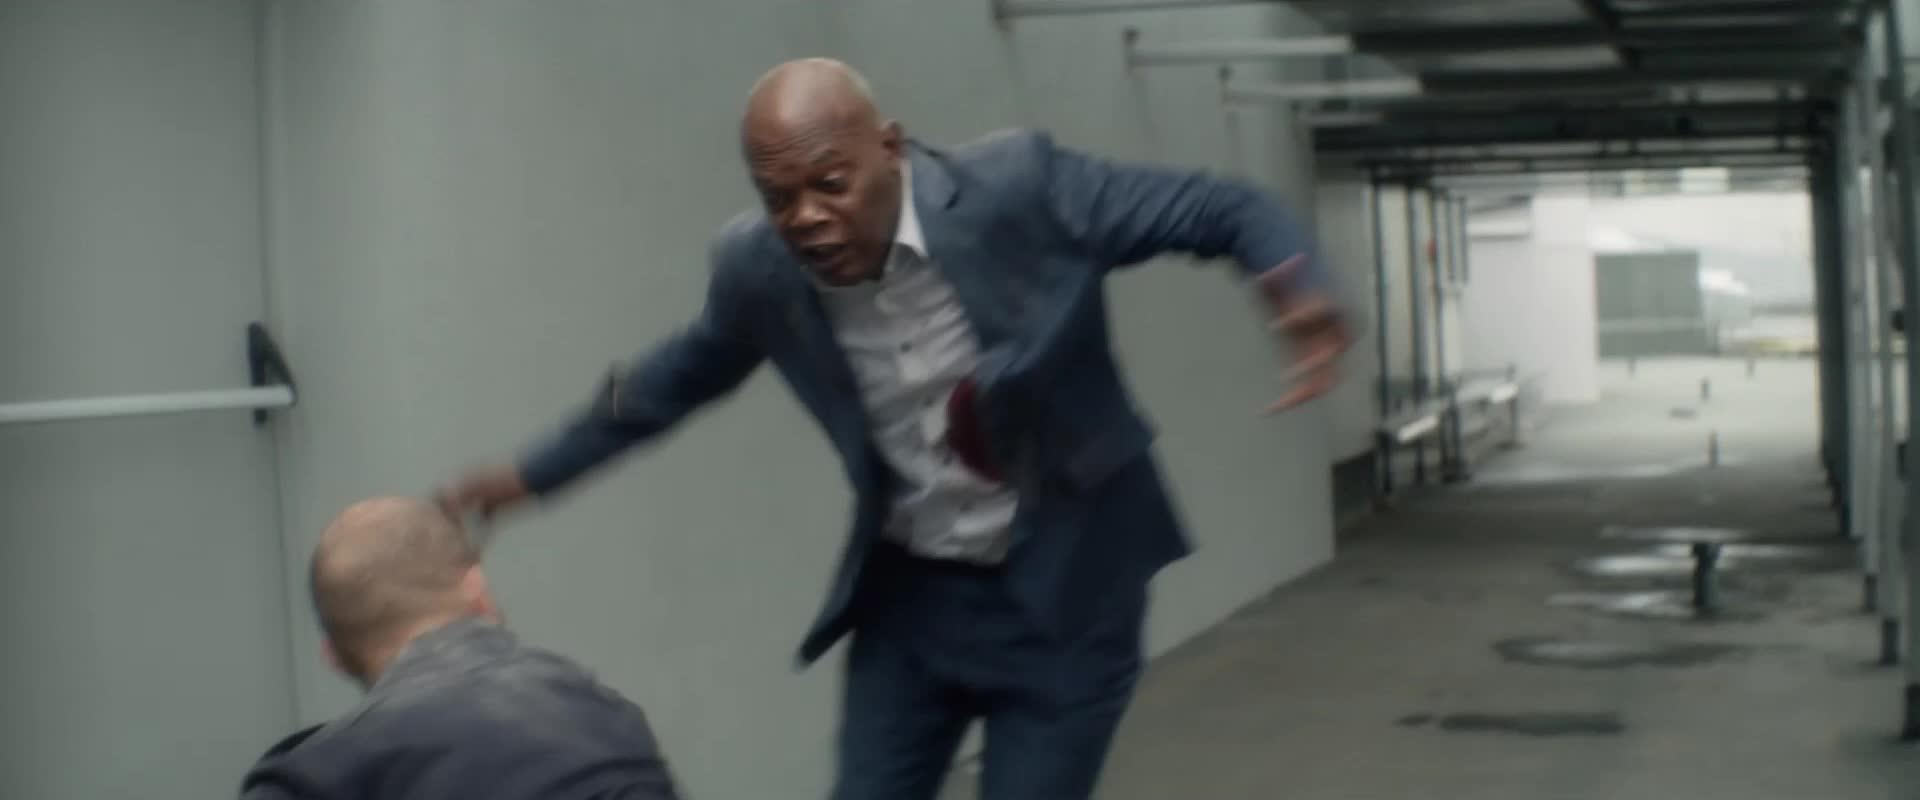 Lionsgate, Samuel L. Jackson, The Hitman's Bodyguard, TheHitman'sBodyguard, hitmans bodyguard, lionsgate, movie, movies, ryan reynolds, ryanreynolds, samuel l. jackson, samueljackson, the hitmans bodyguard, the hitman's bodyguard, thehitman'sbodyguard, knife fight GIFs